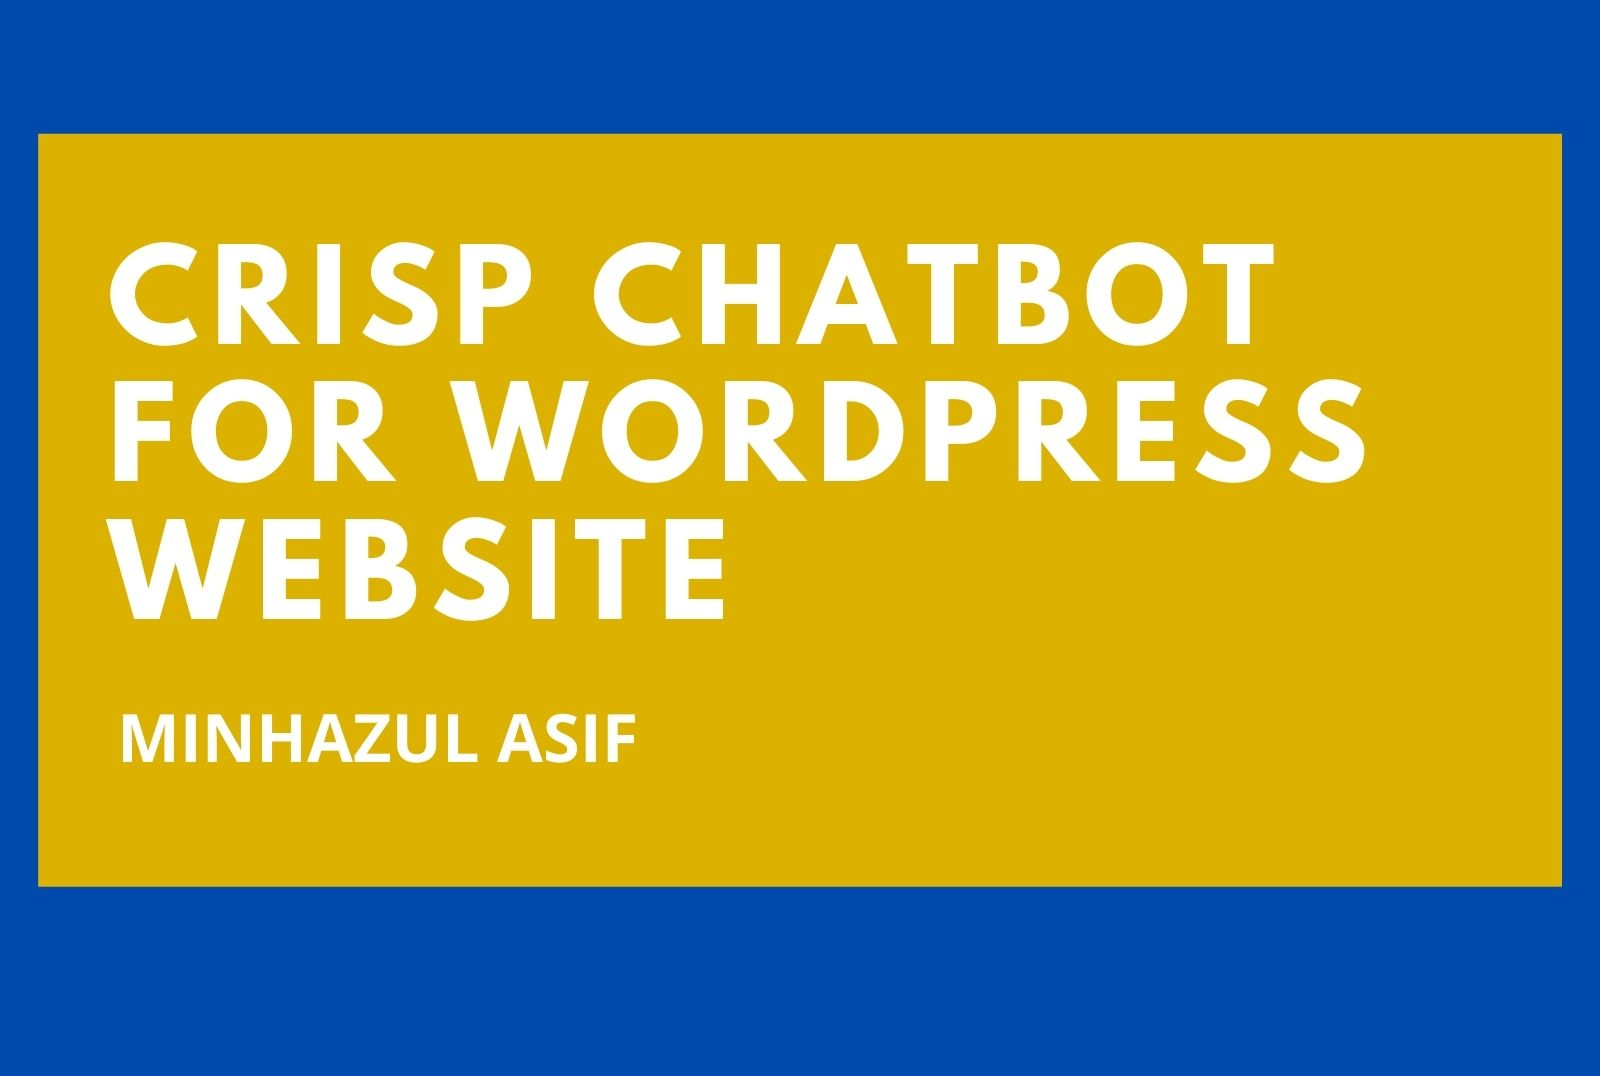 CRISP Chatbot for wordpress website